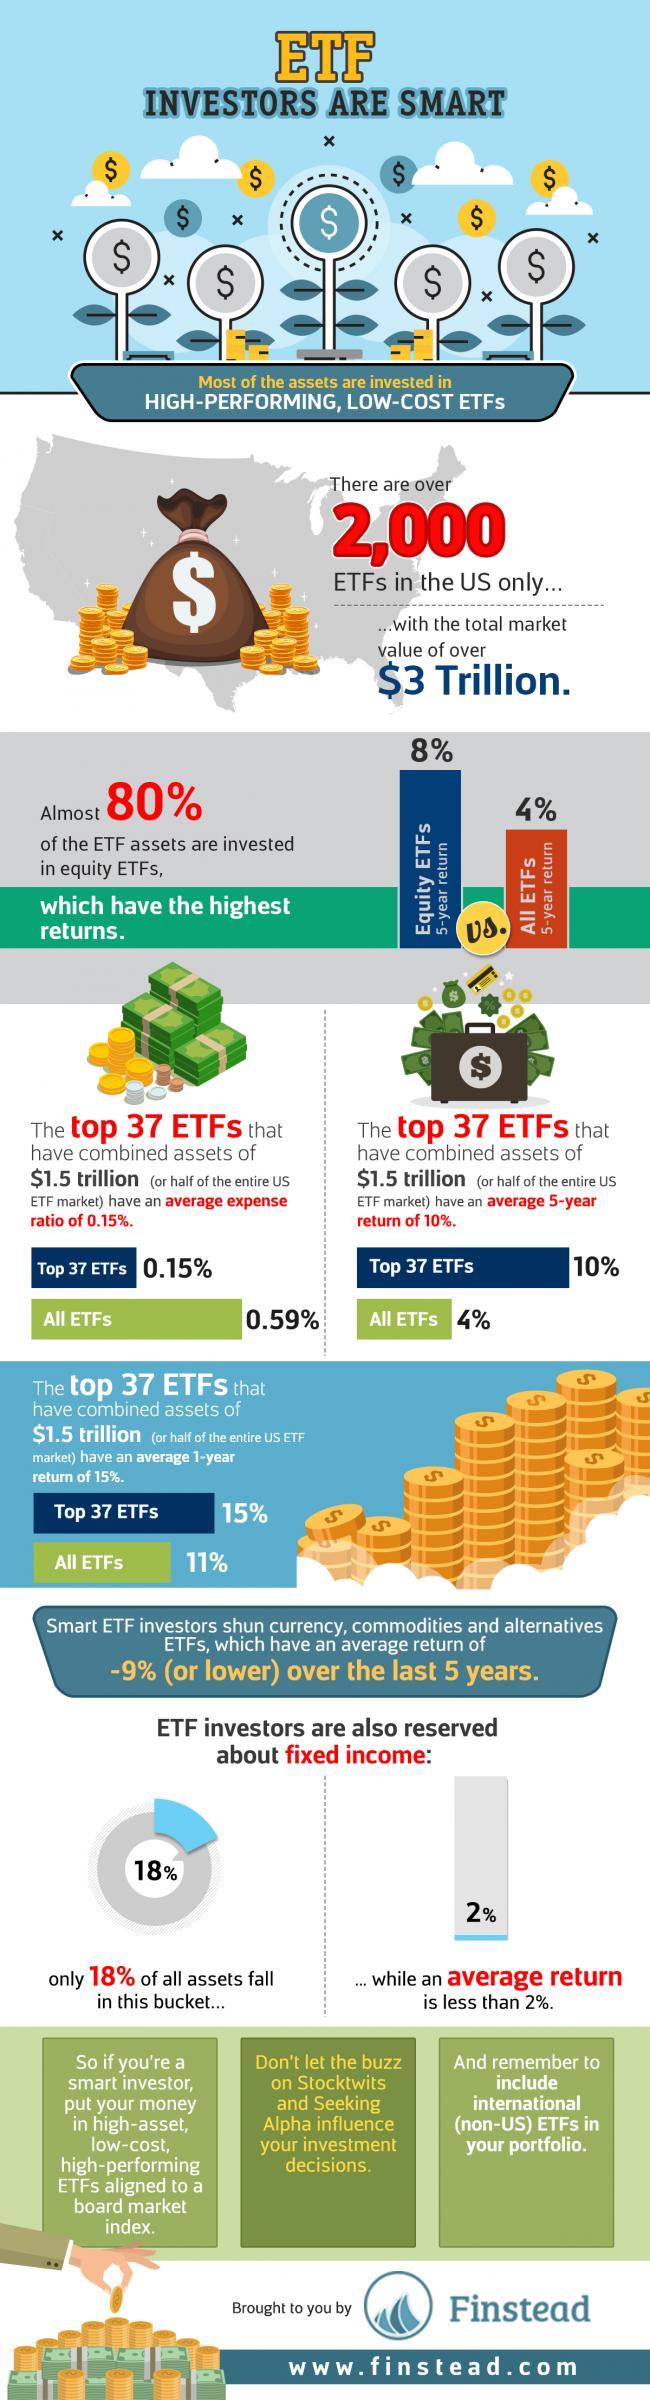 etf_investors_are_smart_1.jpg